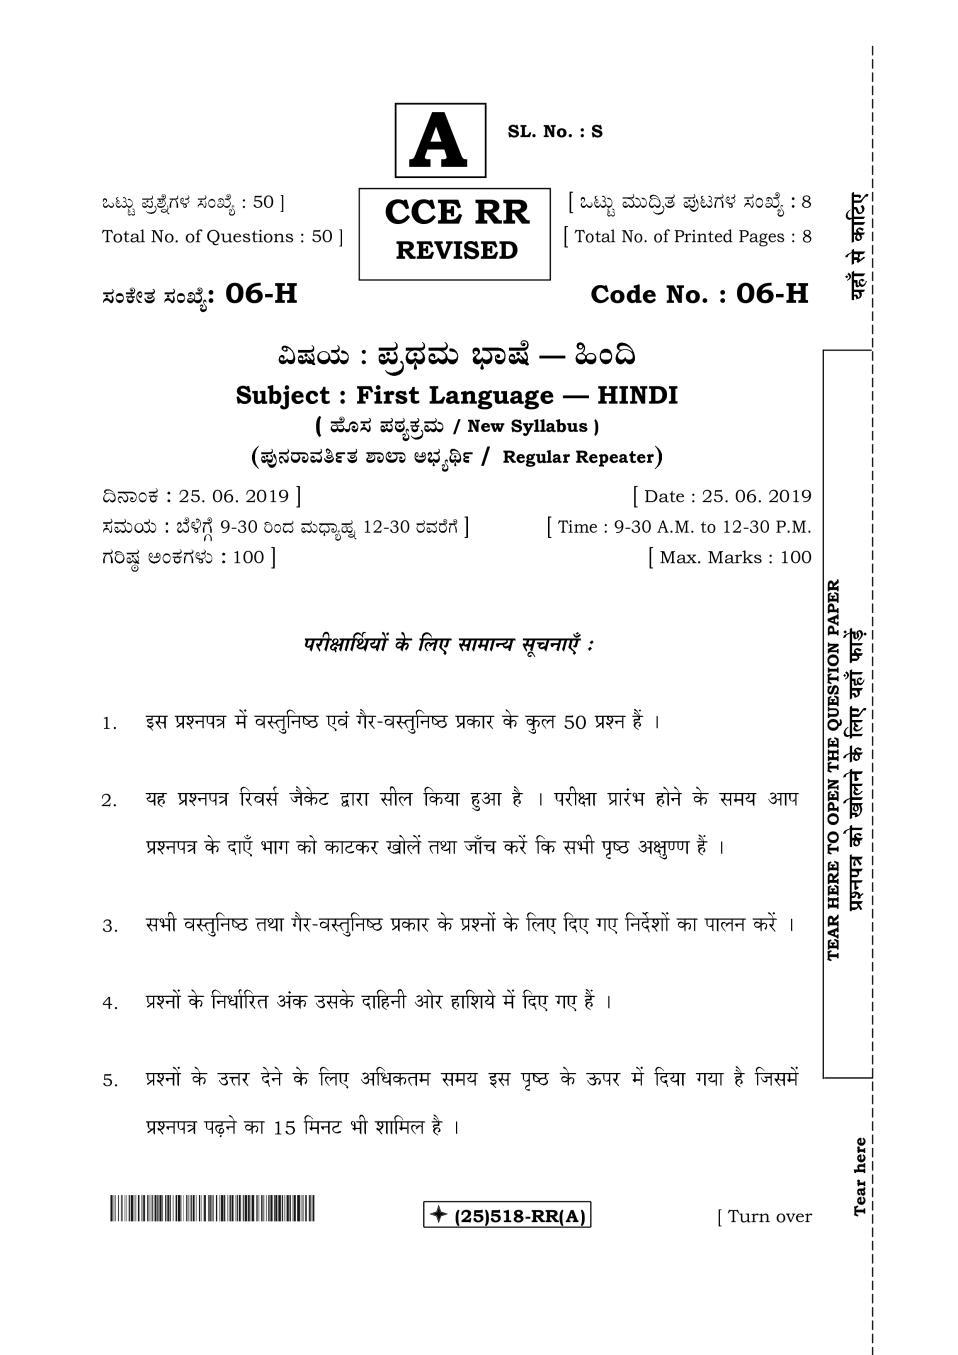 Karnataka SSLC Telugu I Question Paper Jun 2019 - Page 1